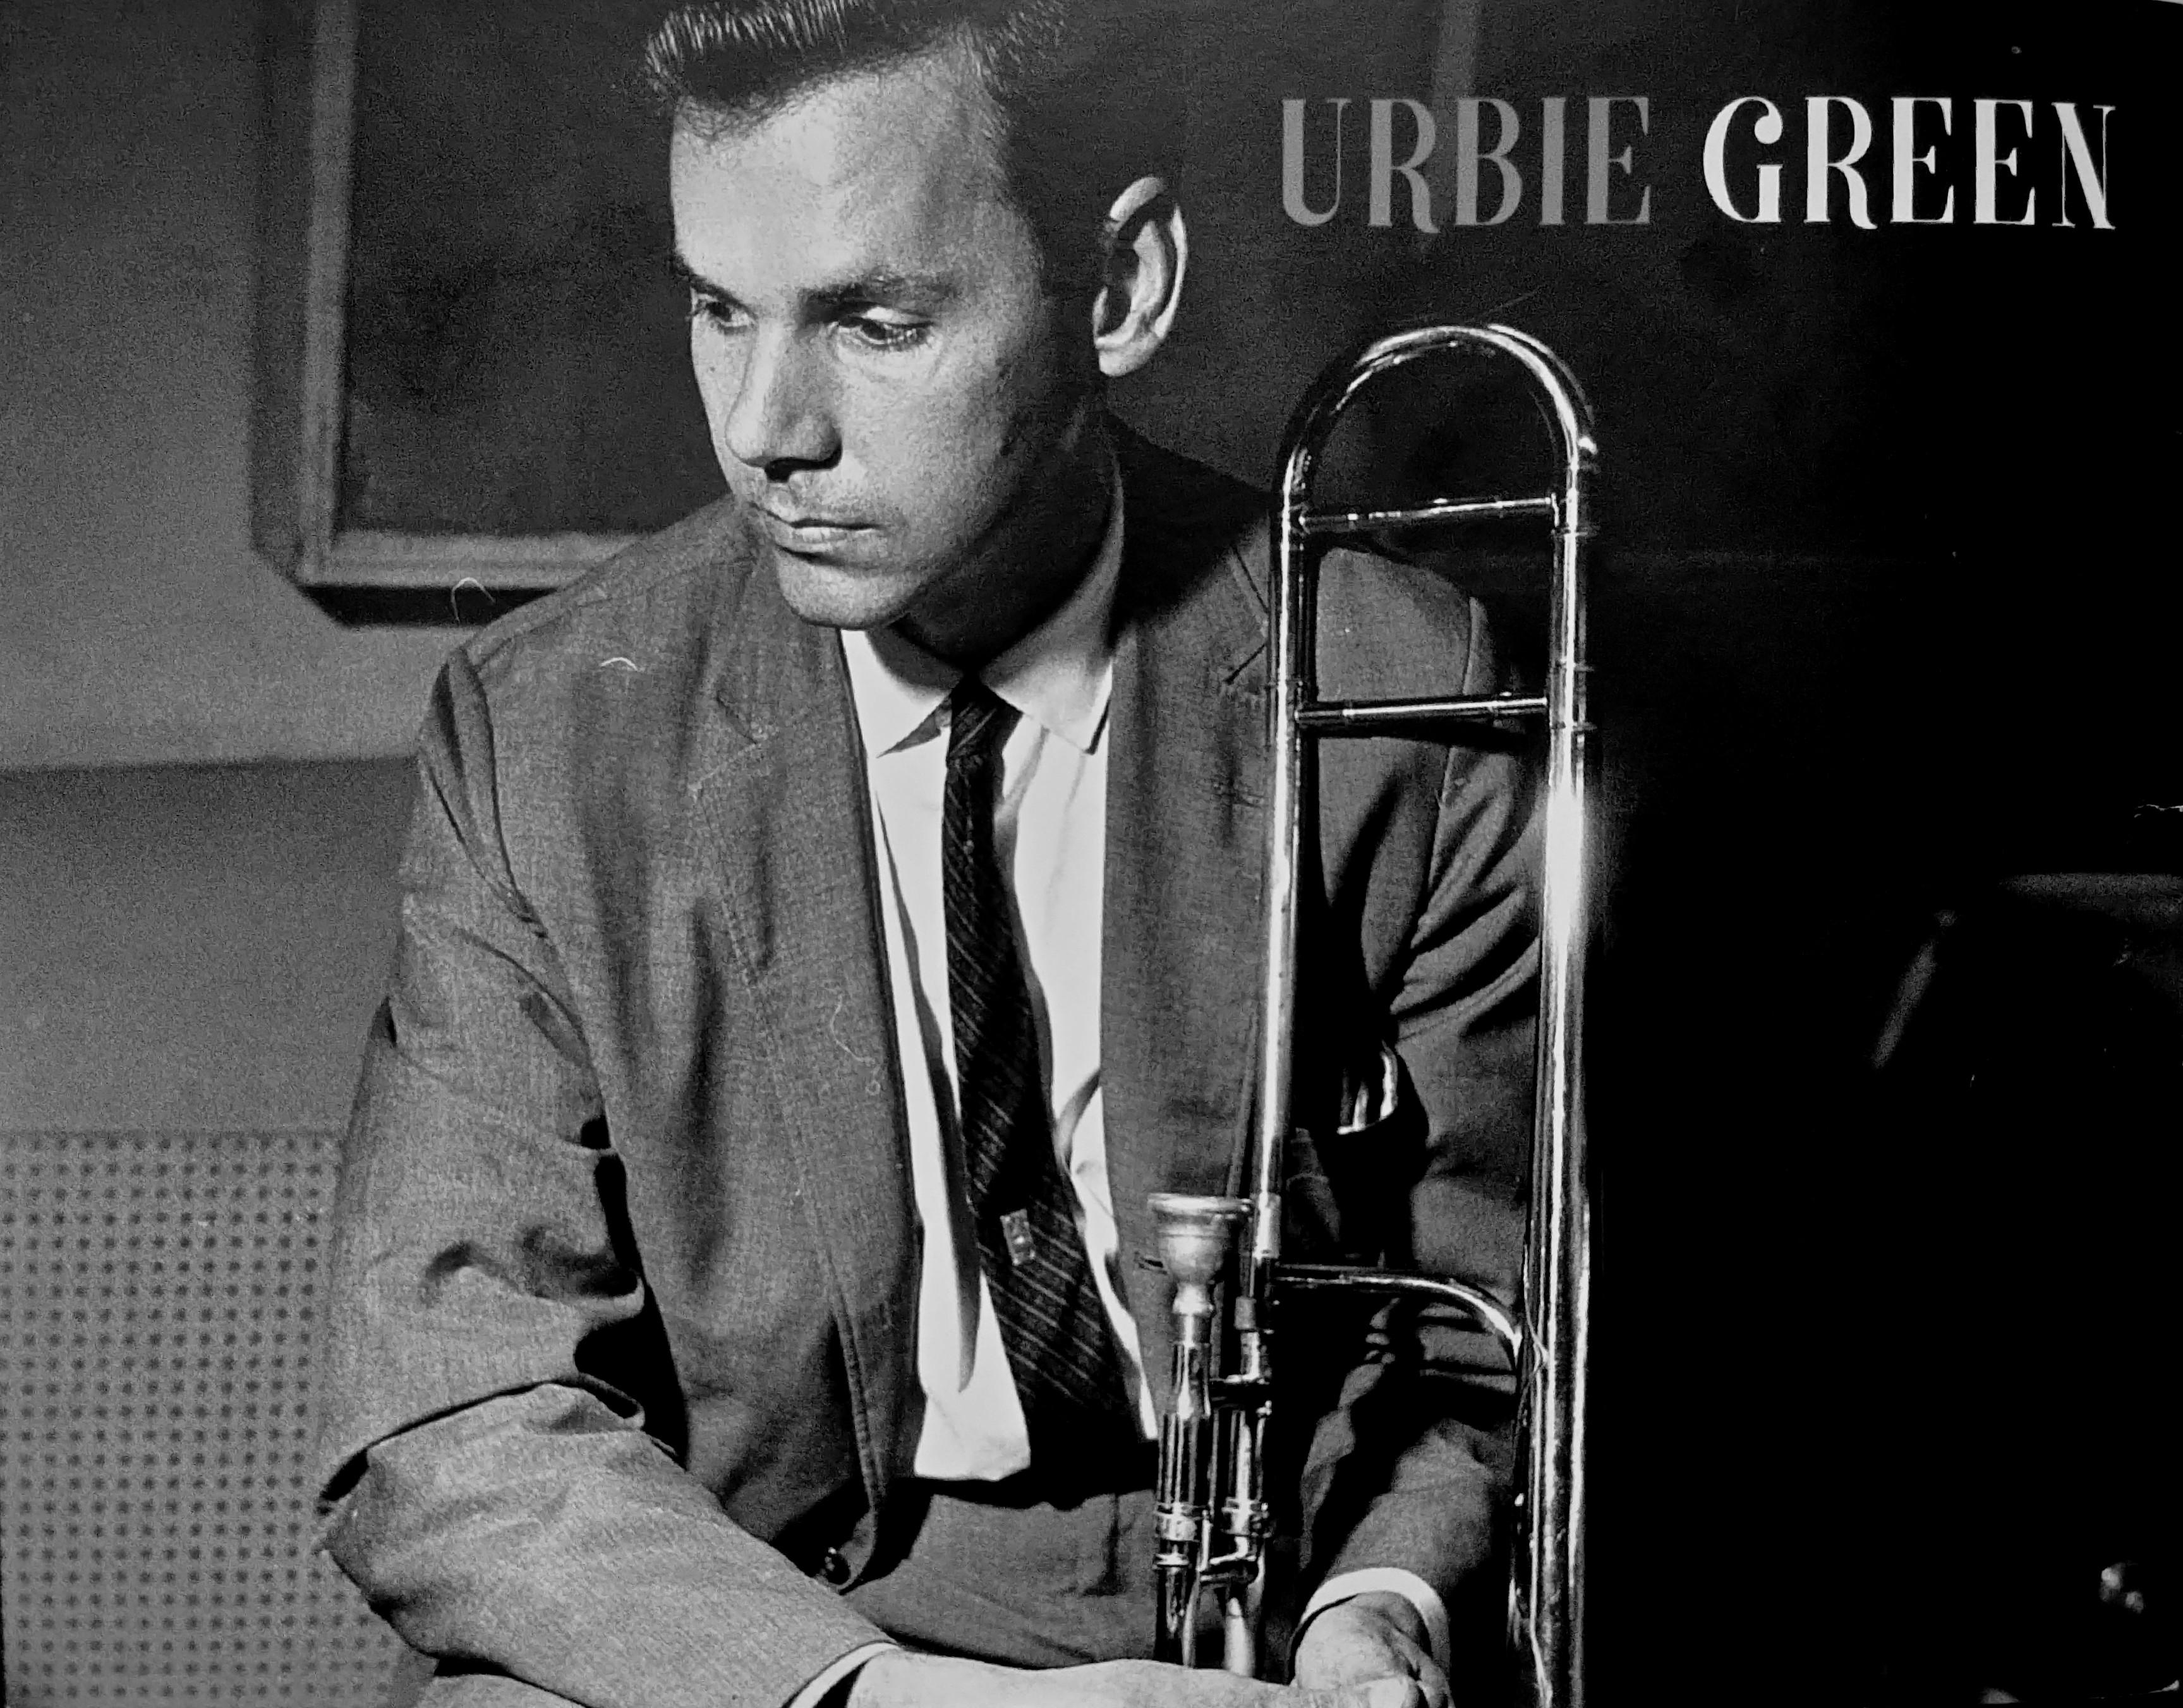 Urbie Green - The Note